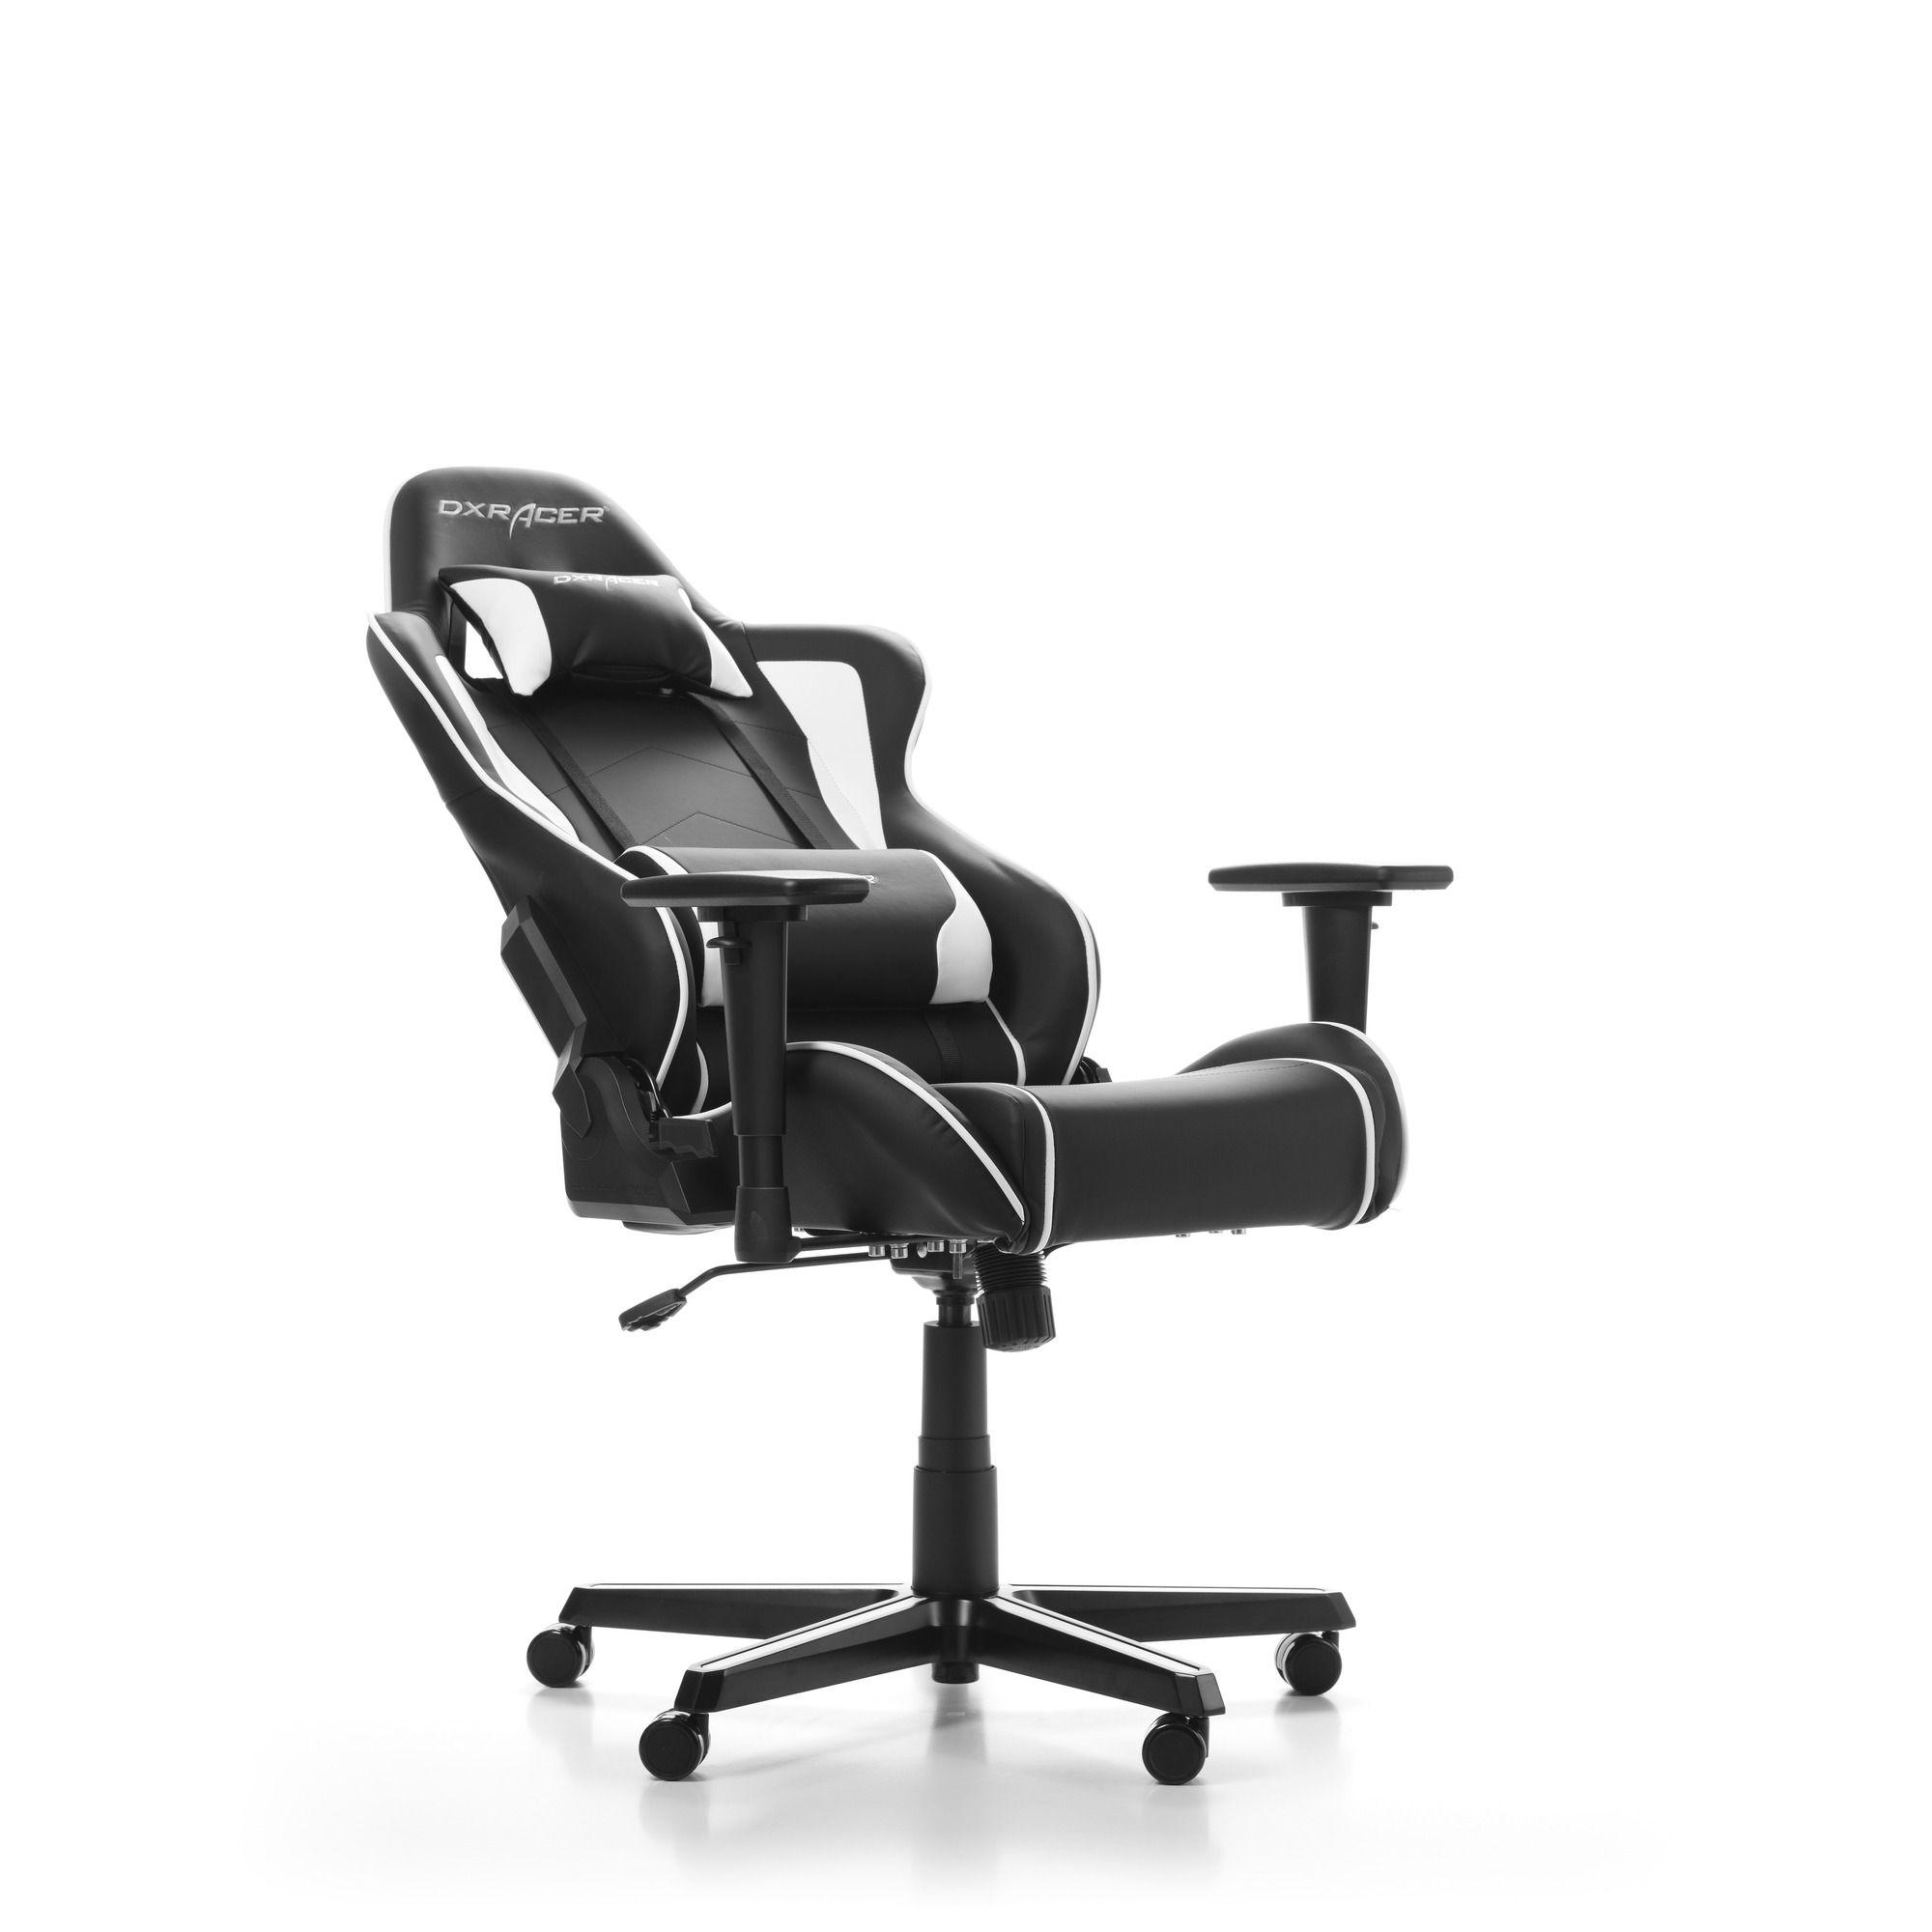 Гейминг стол DXRacer OH/FH08/NW - серия FORMULA, черен/бял - 4